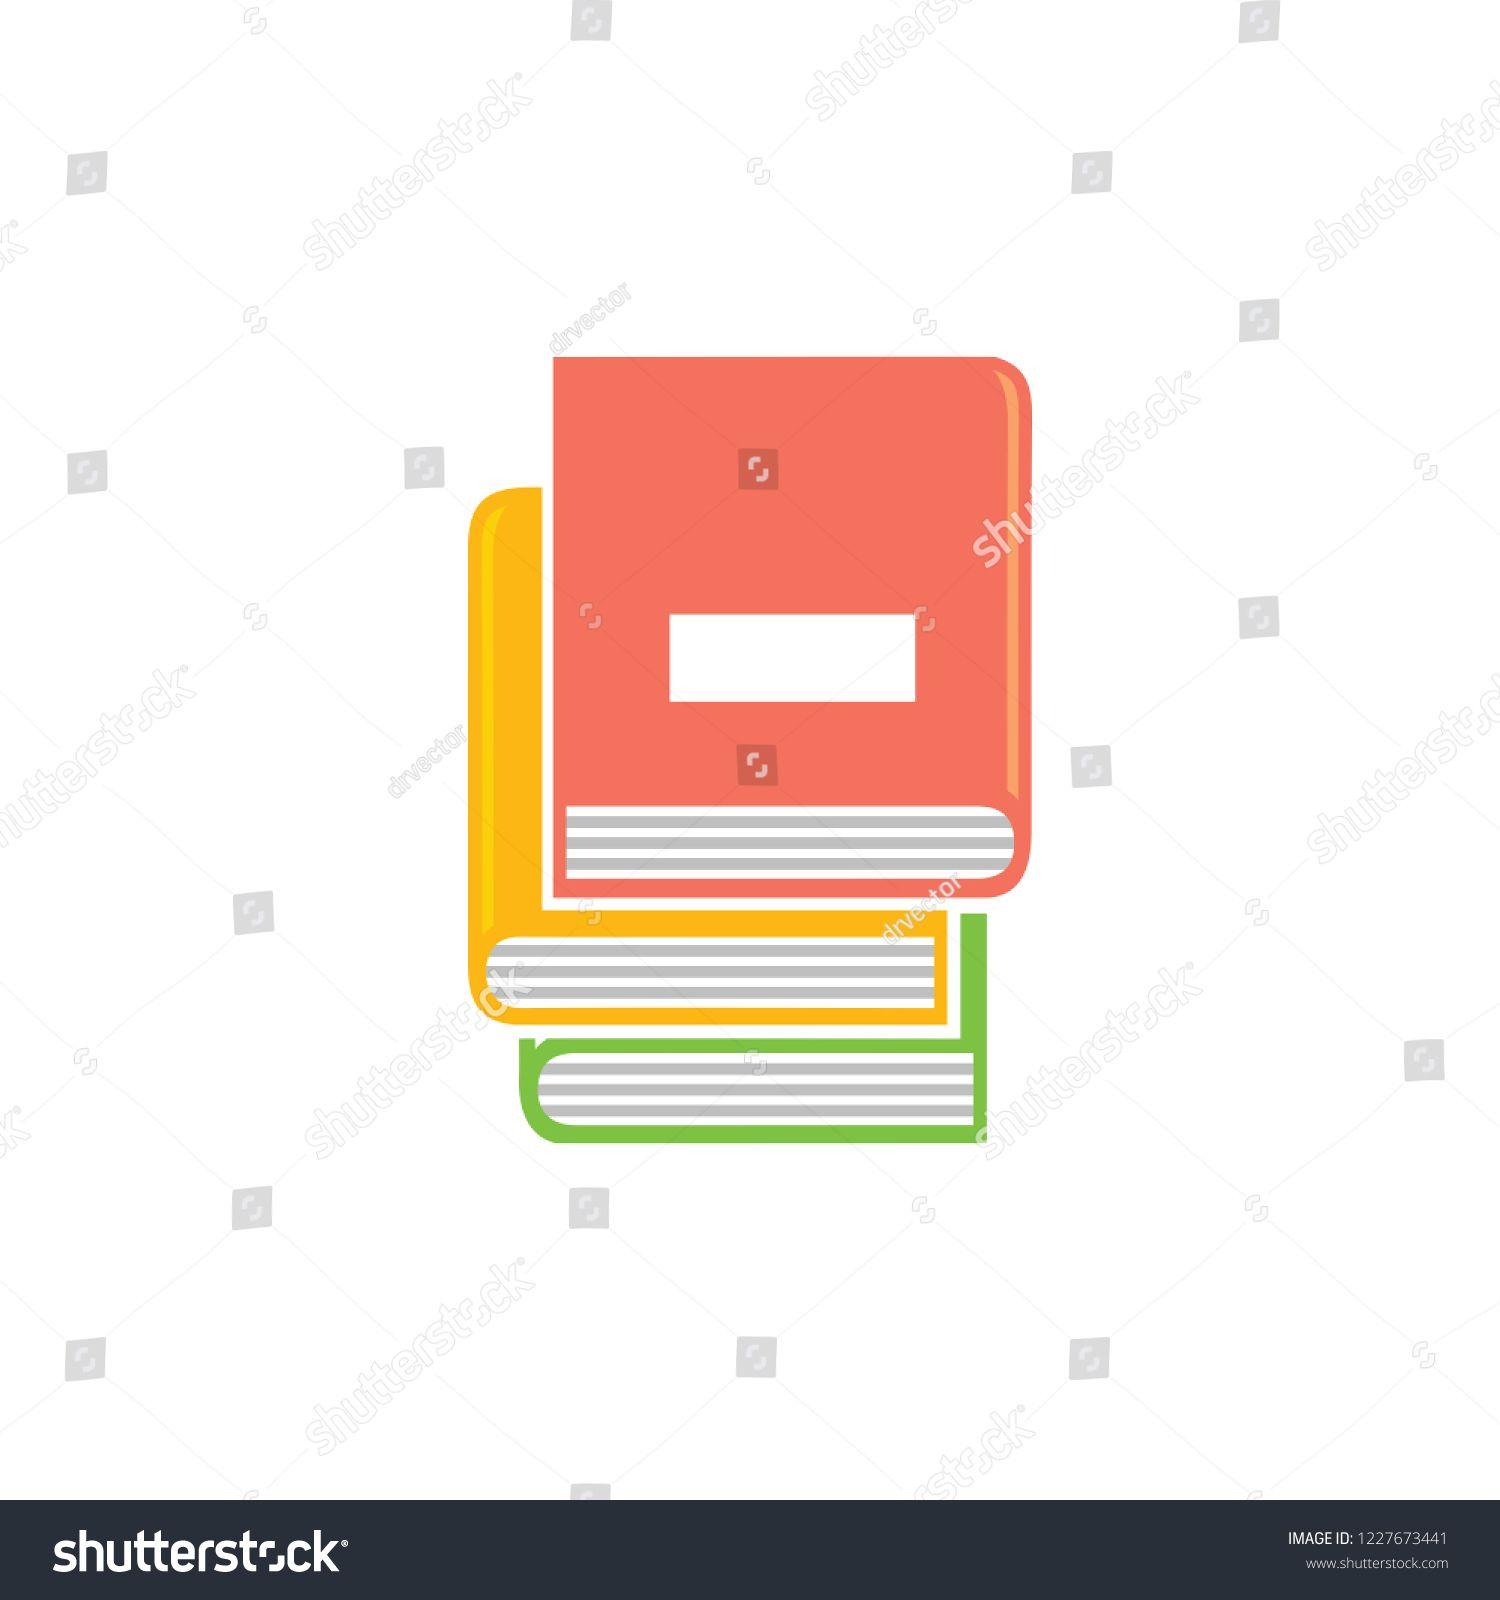 Books Icon Vector Education Books Books Library Education Icon